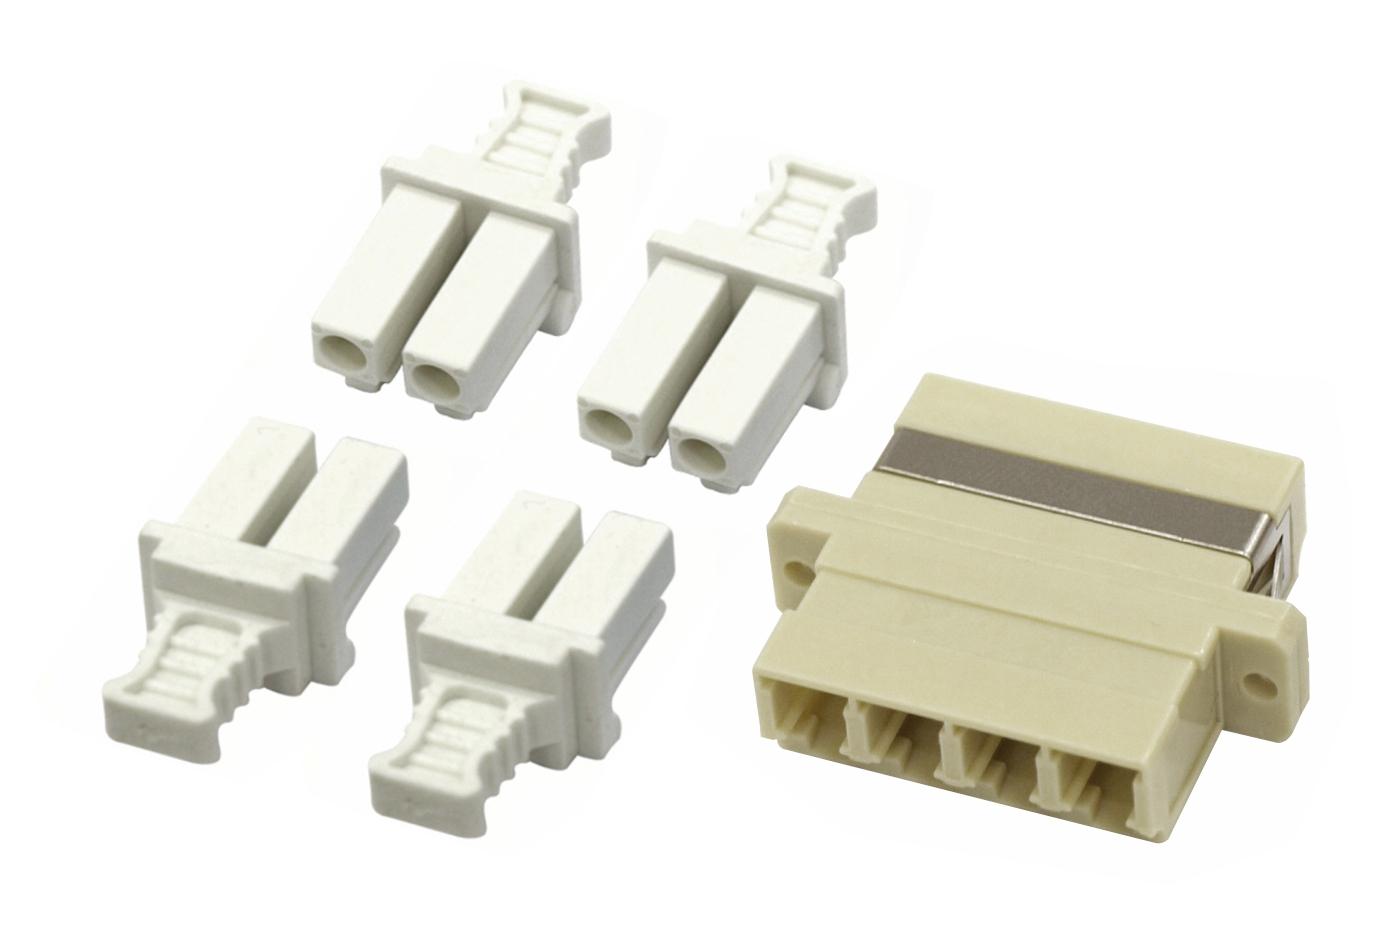 1 Stk LWL Kupplung LC-Quad, Multimode, phbr, Flansch, grau HMOL000105